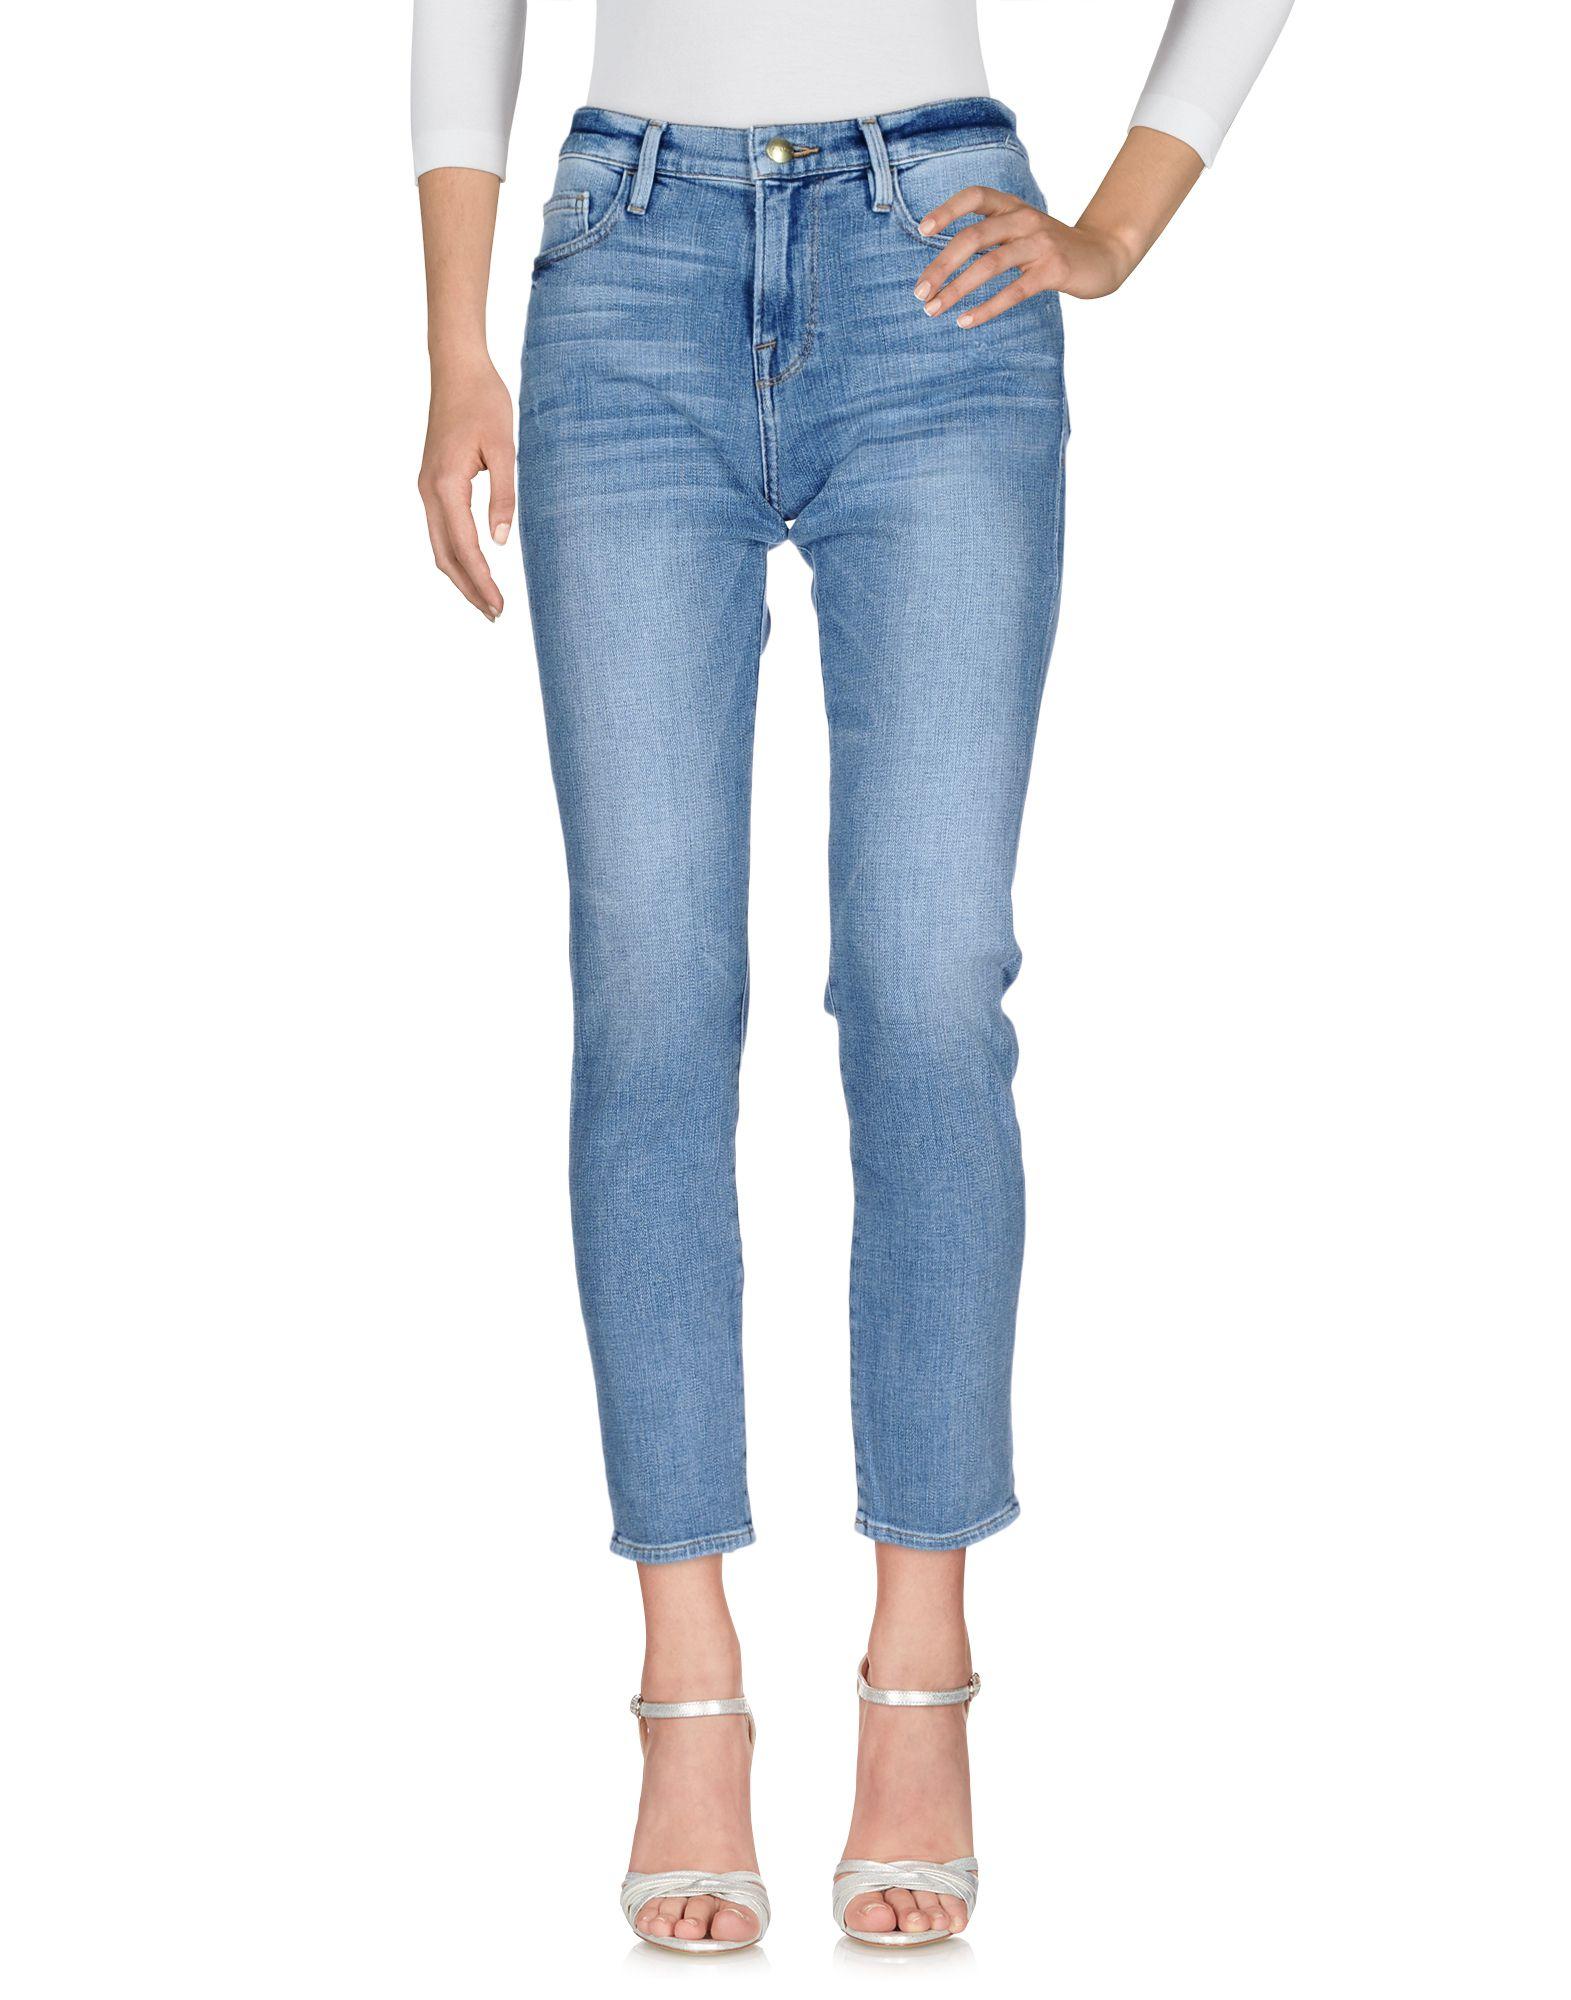 Pantaloni Jeans Frame Donna - Acquista online su mTp9Ezn